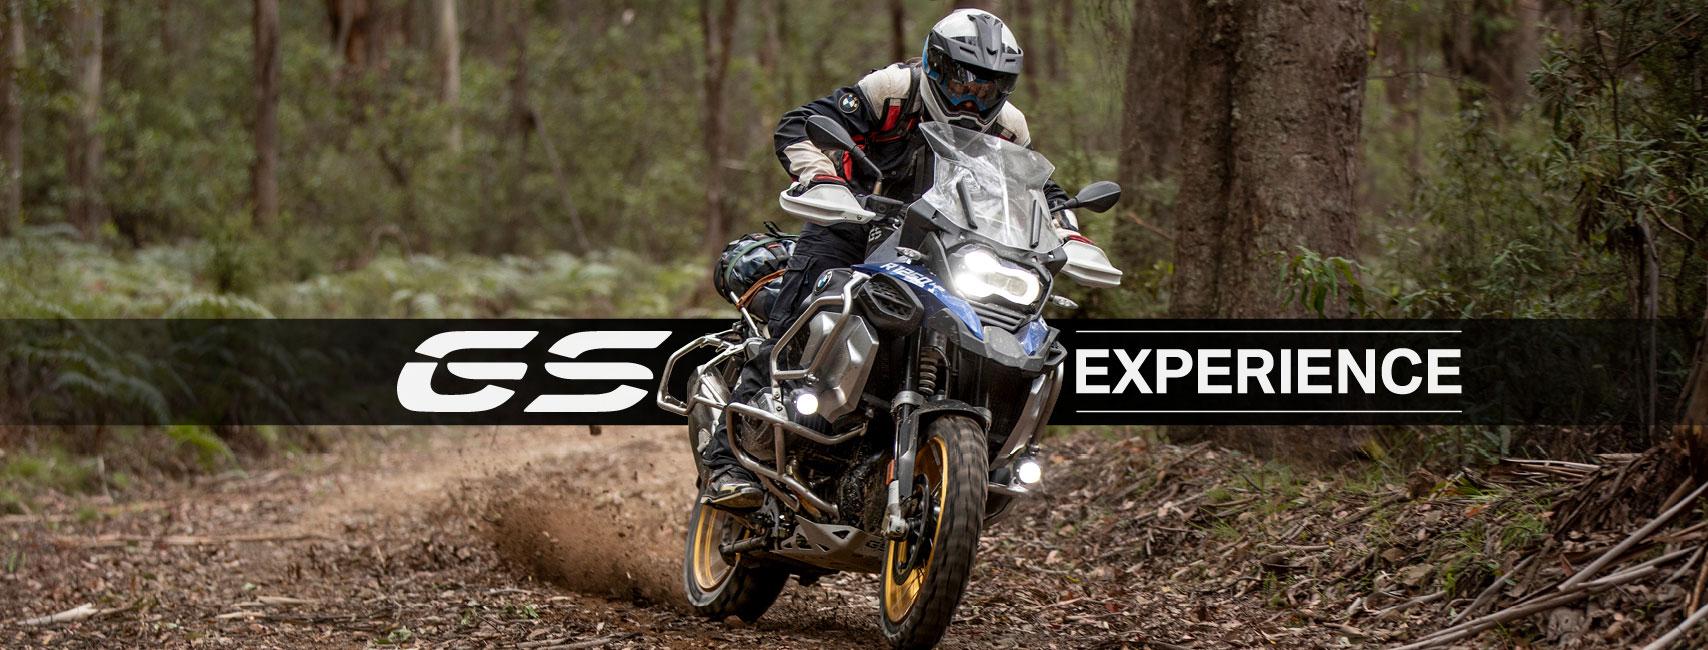 2019 BMW Motorrad GS Experience